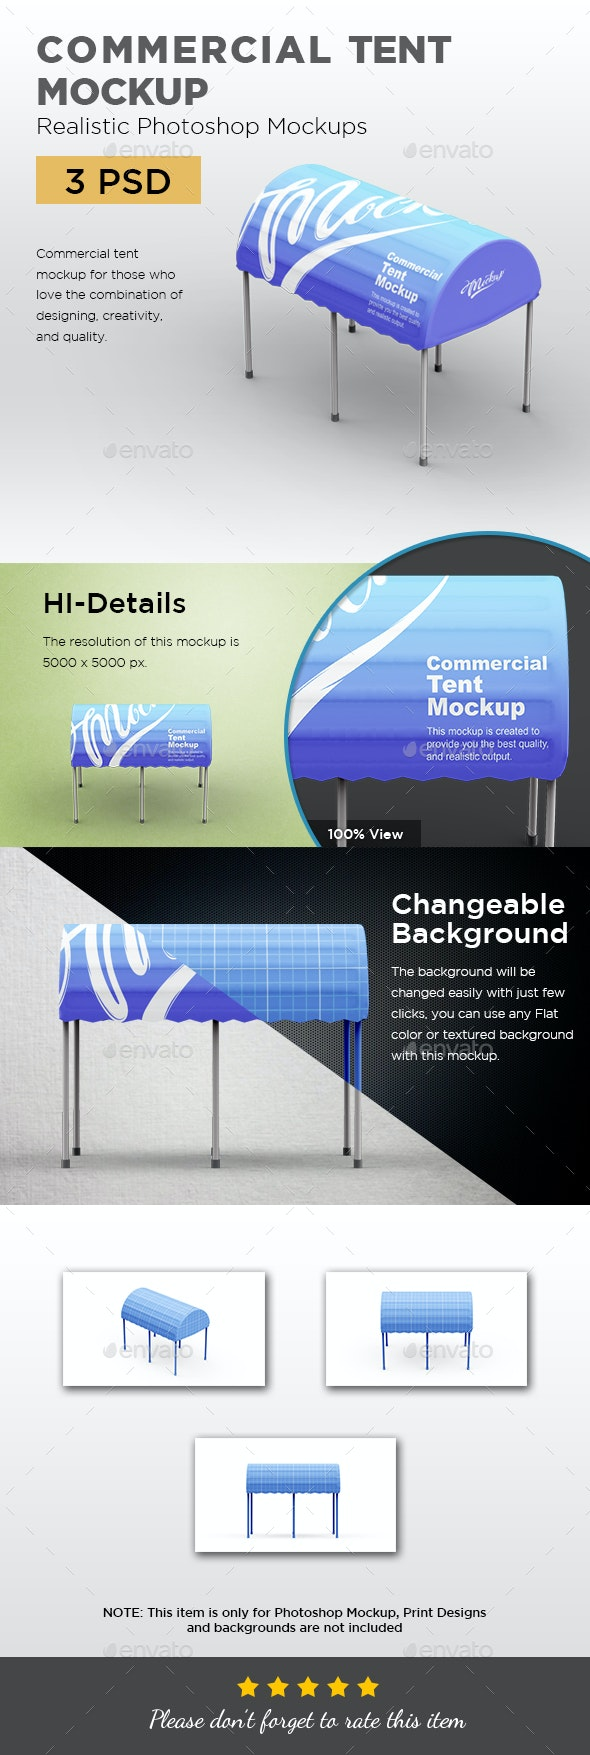 Commercial Tent Mockup - Print Product Mock-Ups